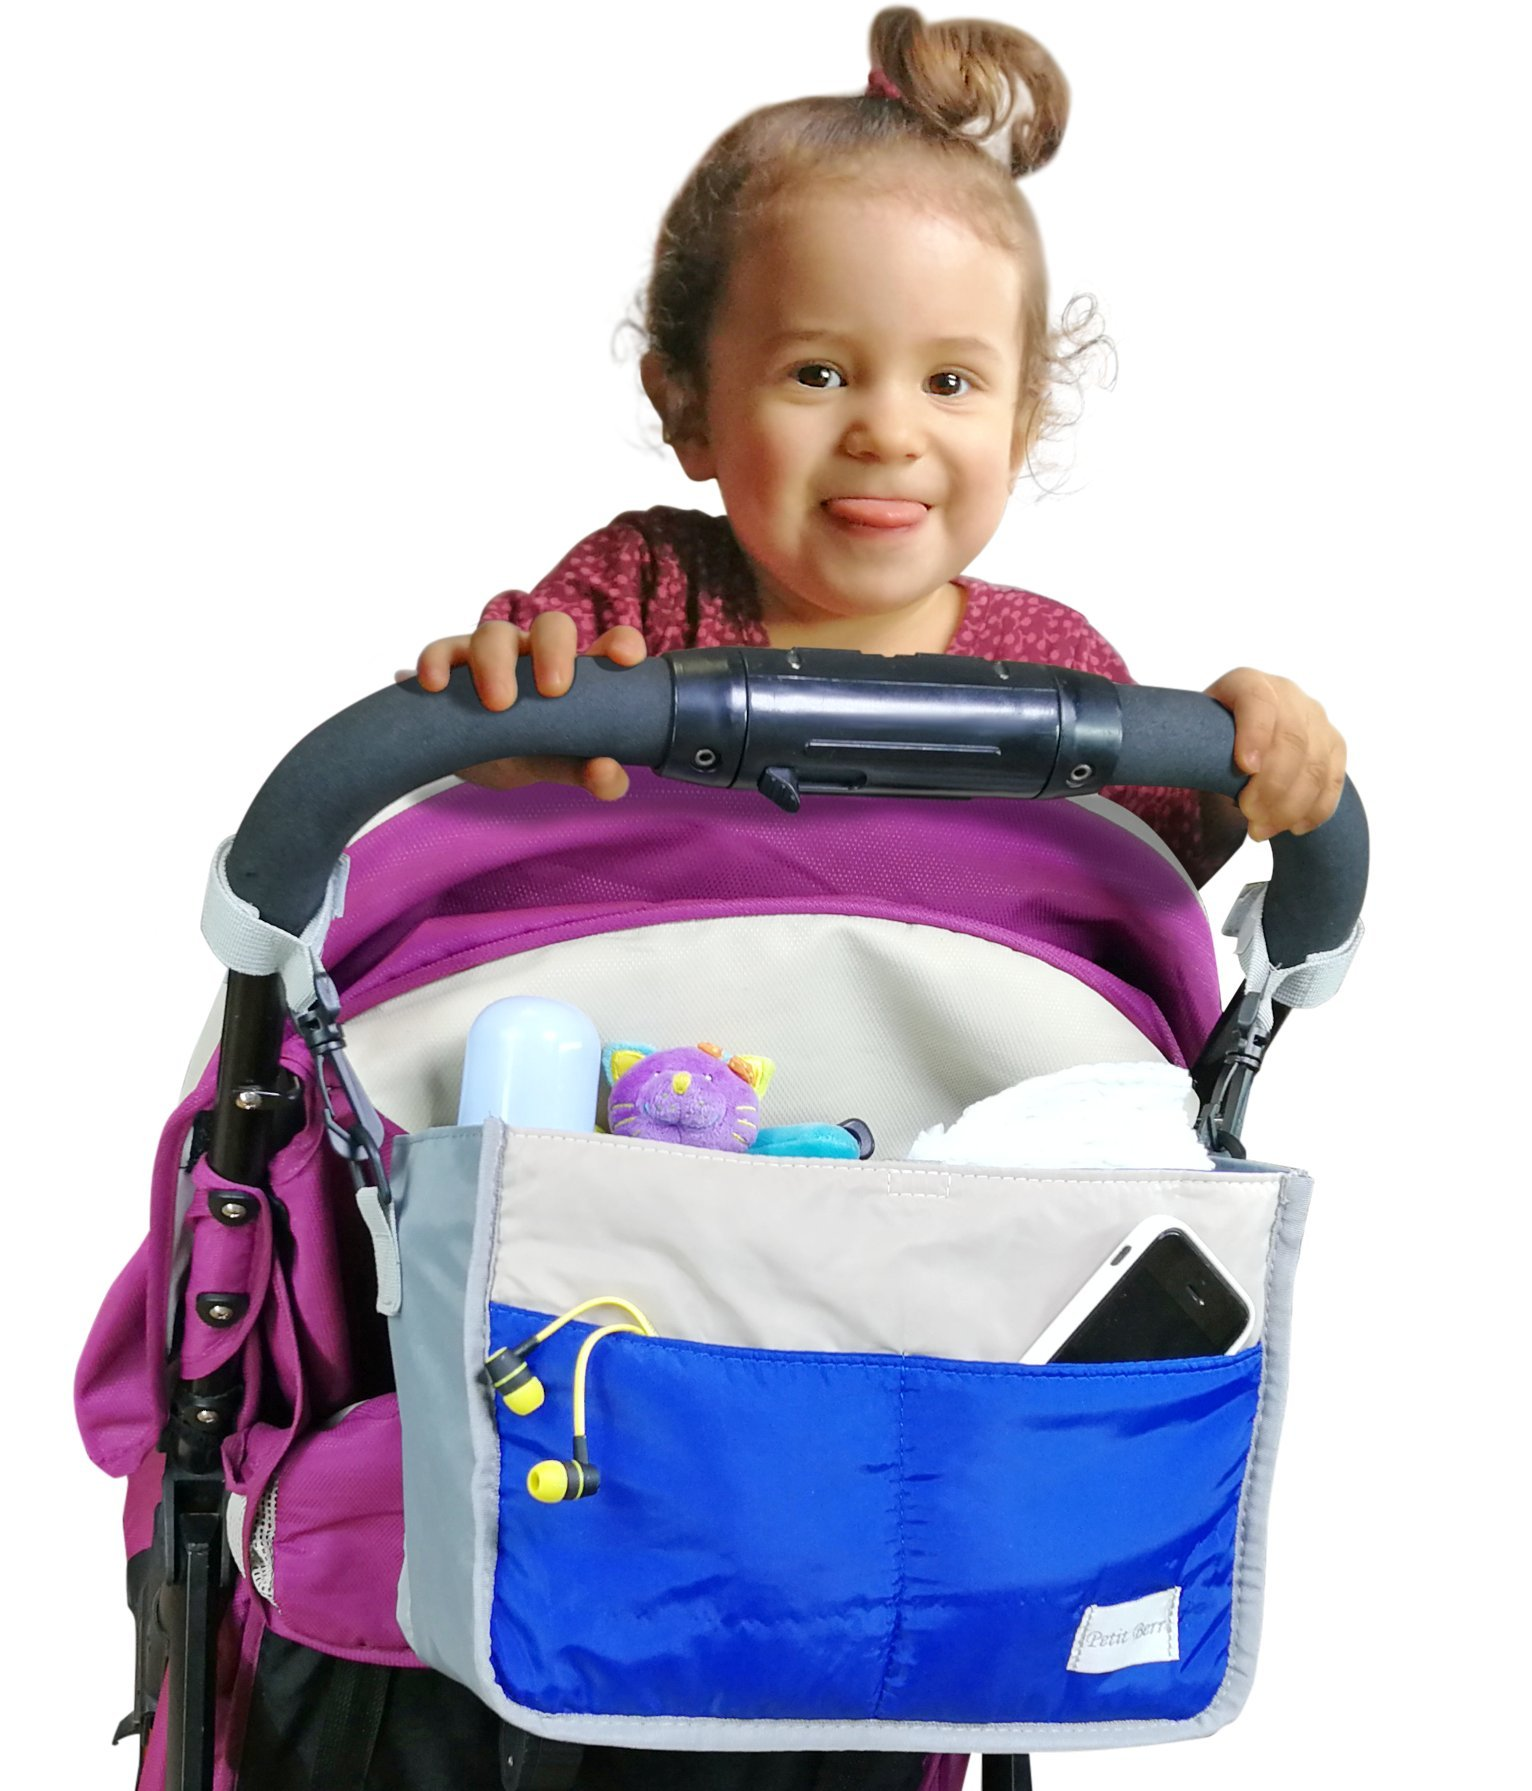 My FL Universal Baby Stroller Organizer Bottle Cloth Diapers Holder Hanging Storage Bag (Blue)